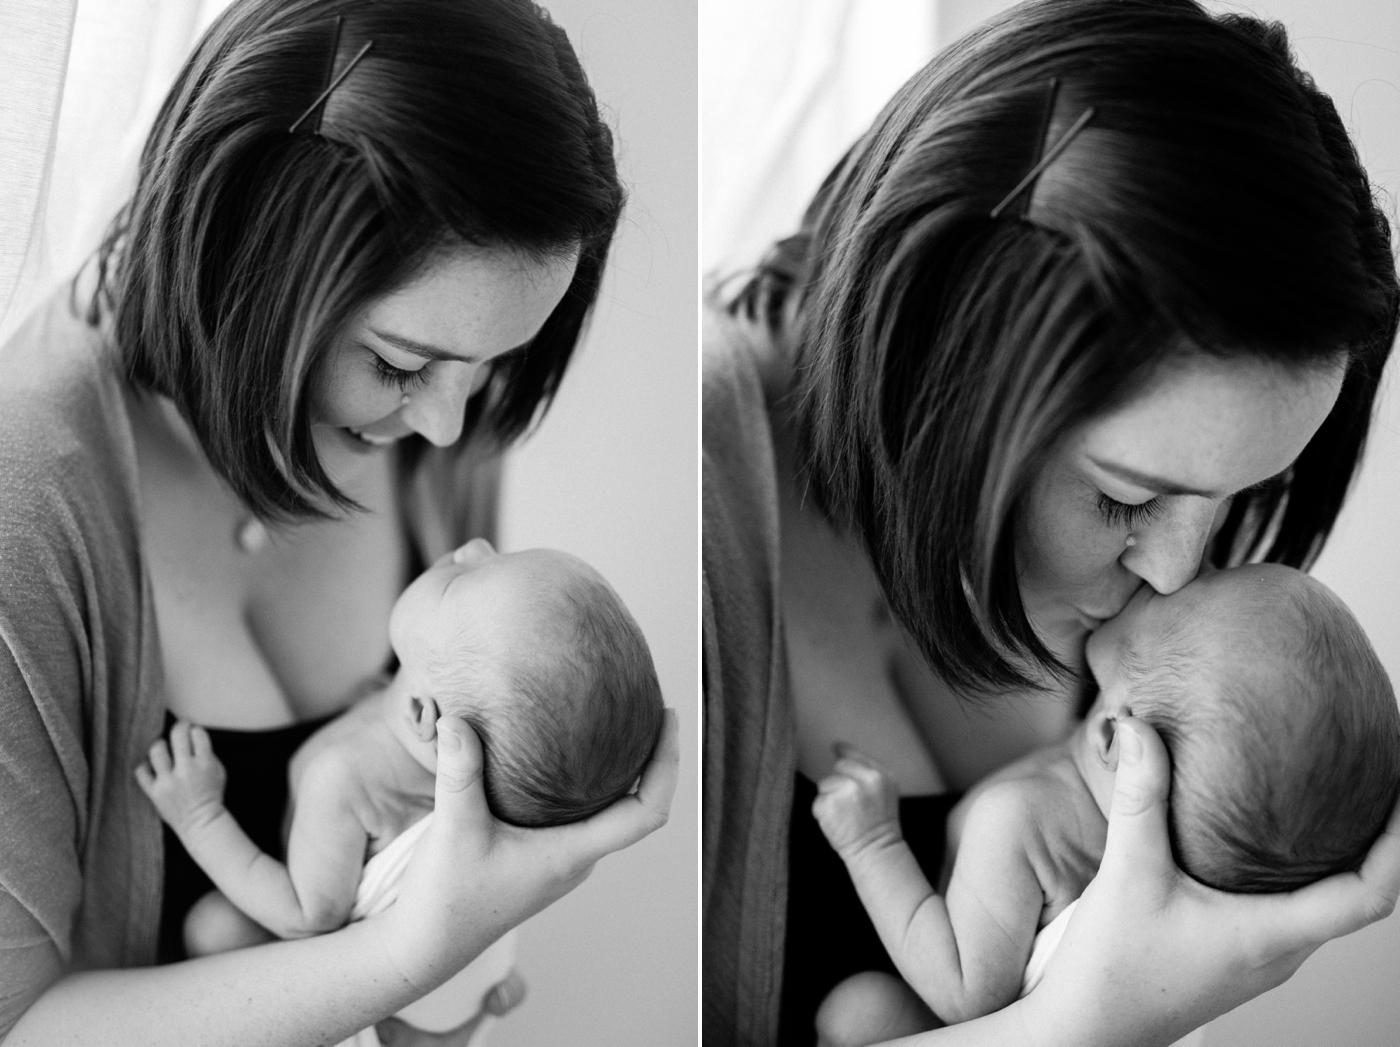 Baby William - Natural Newborn Photography in Adelaide - Simple and Beautiful Newborn Photography - Katherine Schultz - Natural Light Newborn Photographer in Adelaide - www.katherineschultzphotography.com_0015.jpg